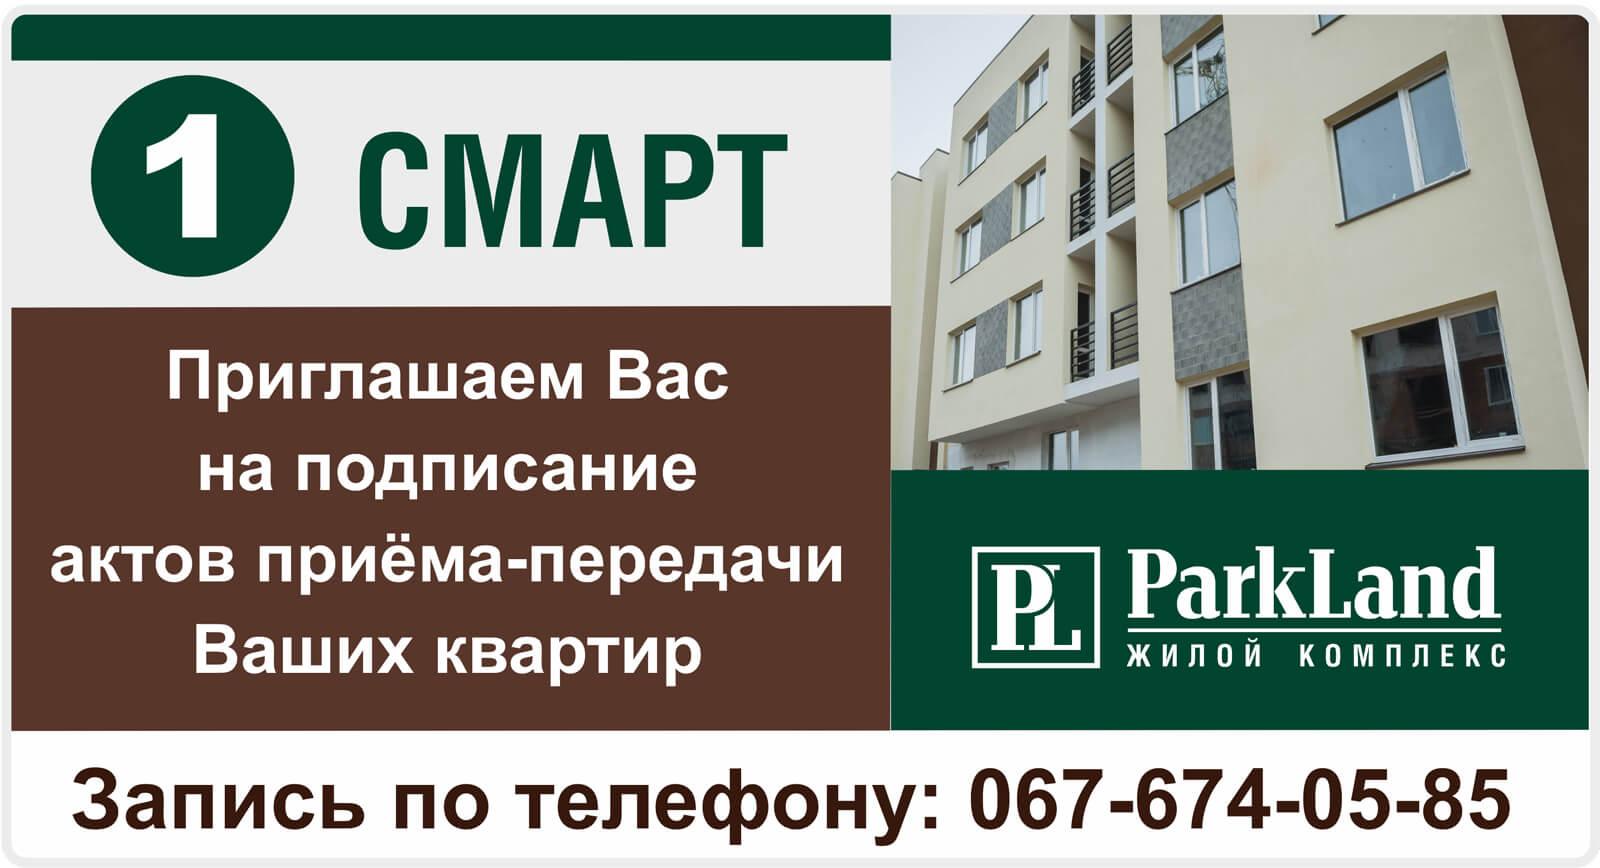 news270318-ru-1